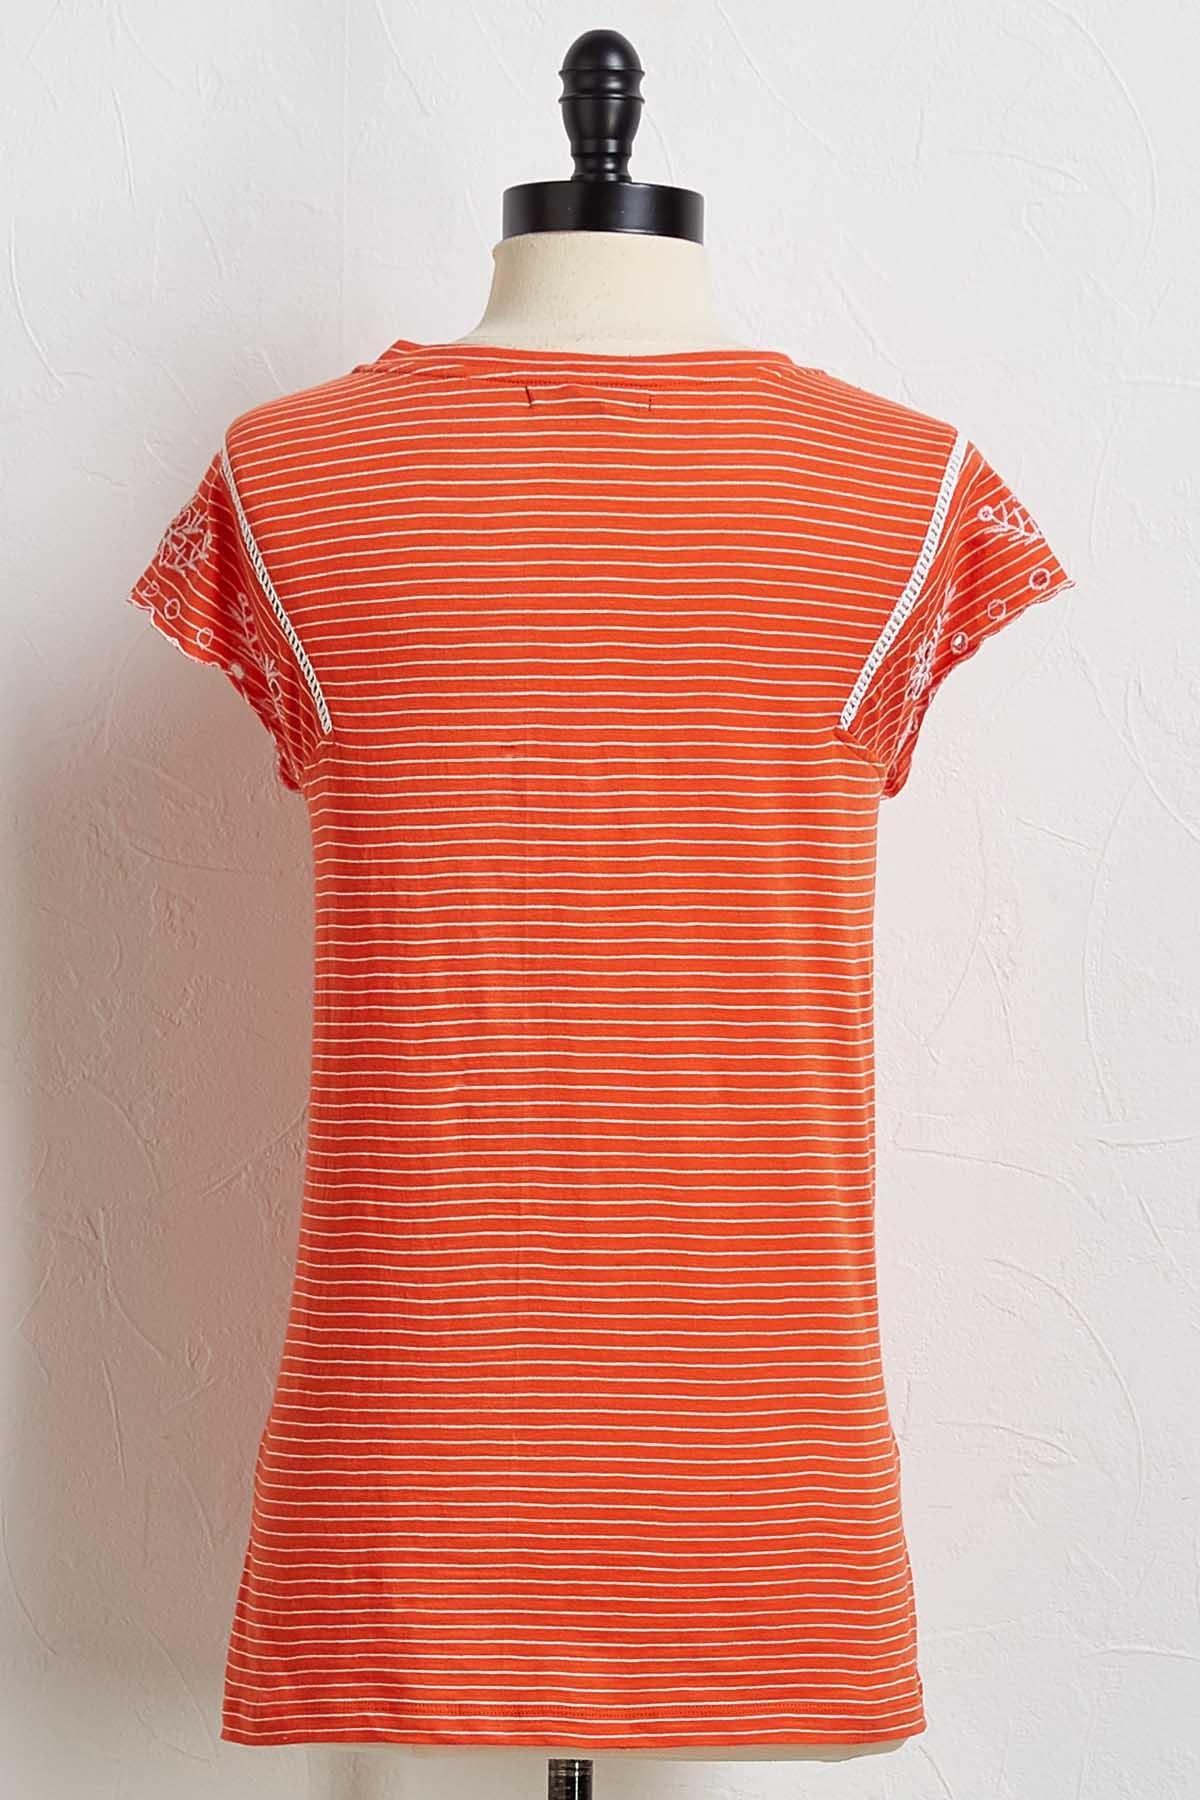 Dreamweaver Striped Tee